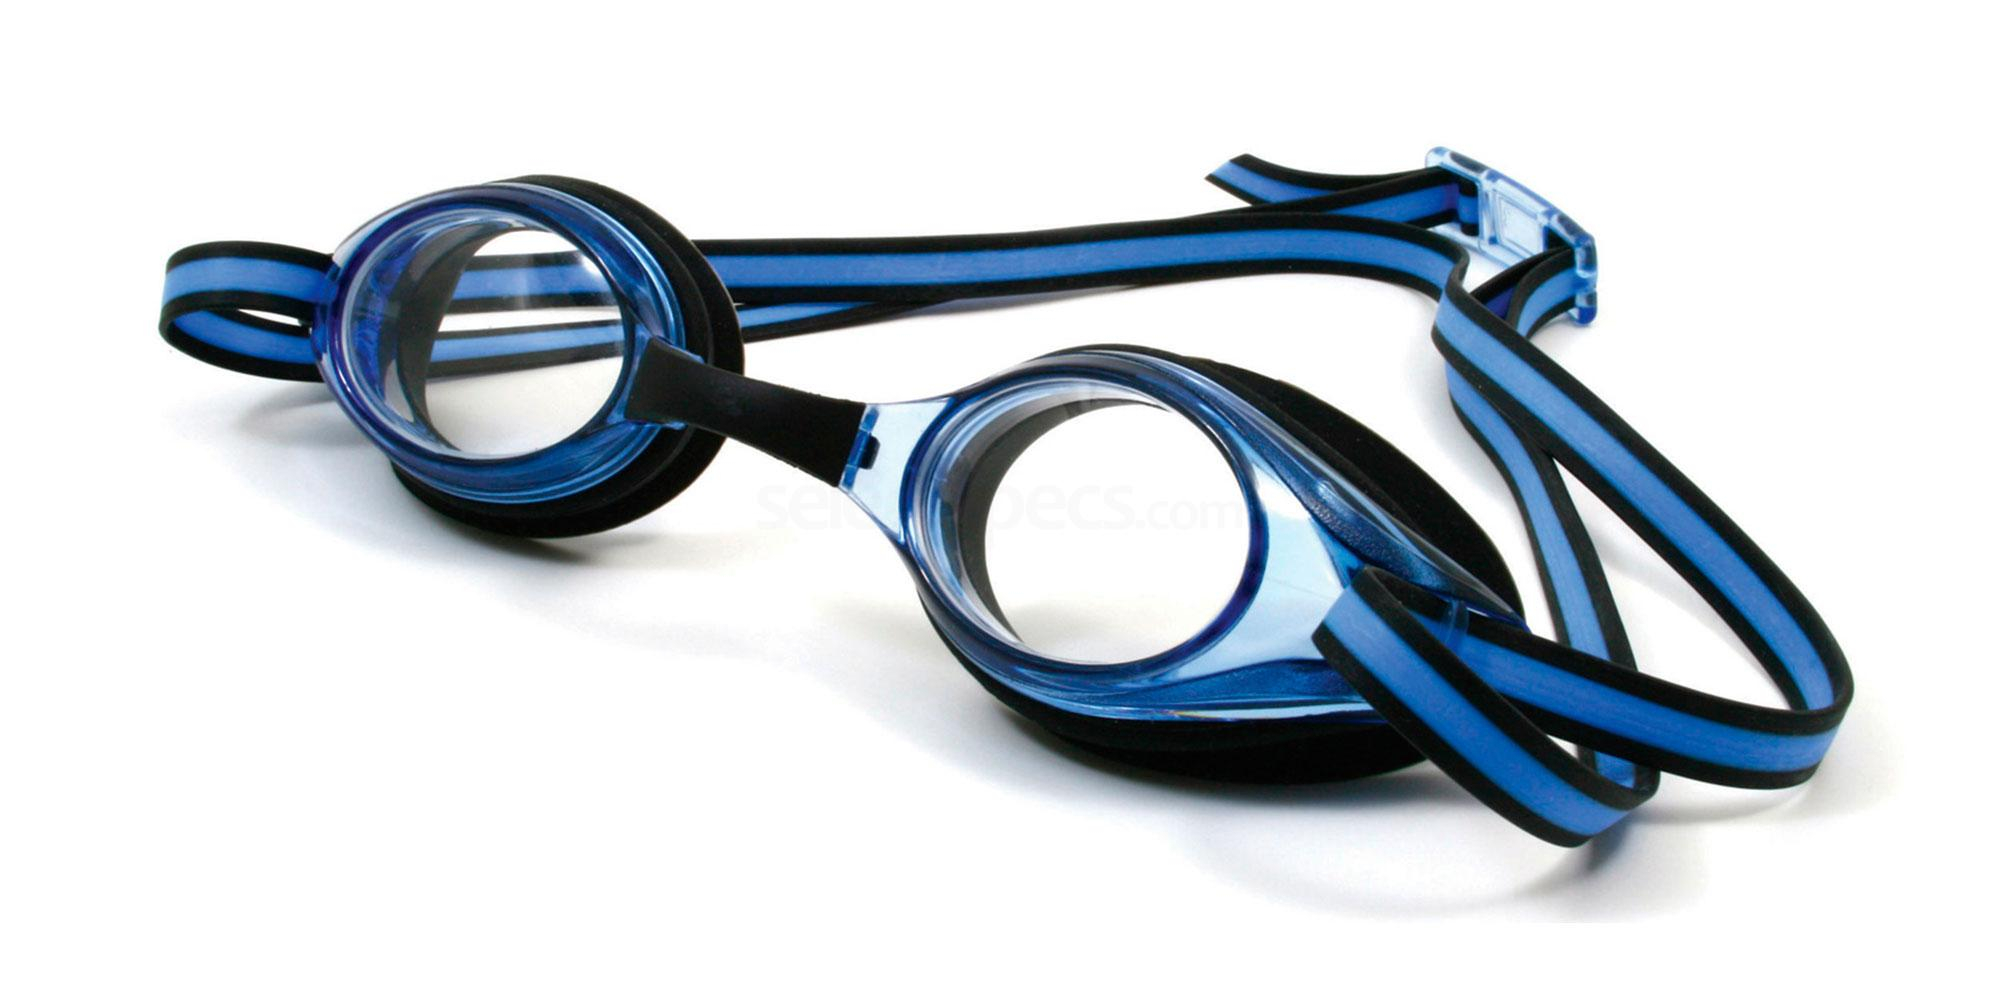 Blue Blick Swim Goggle (12+ years) Accessories, Sports Eyewear Kids